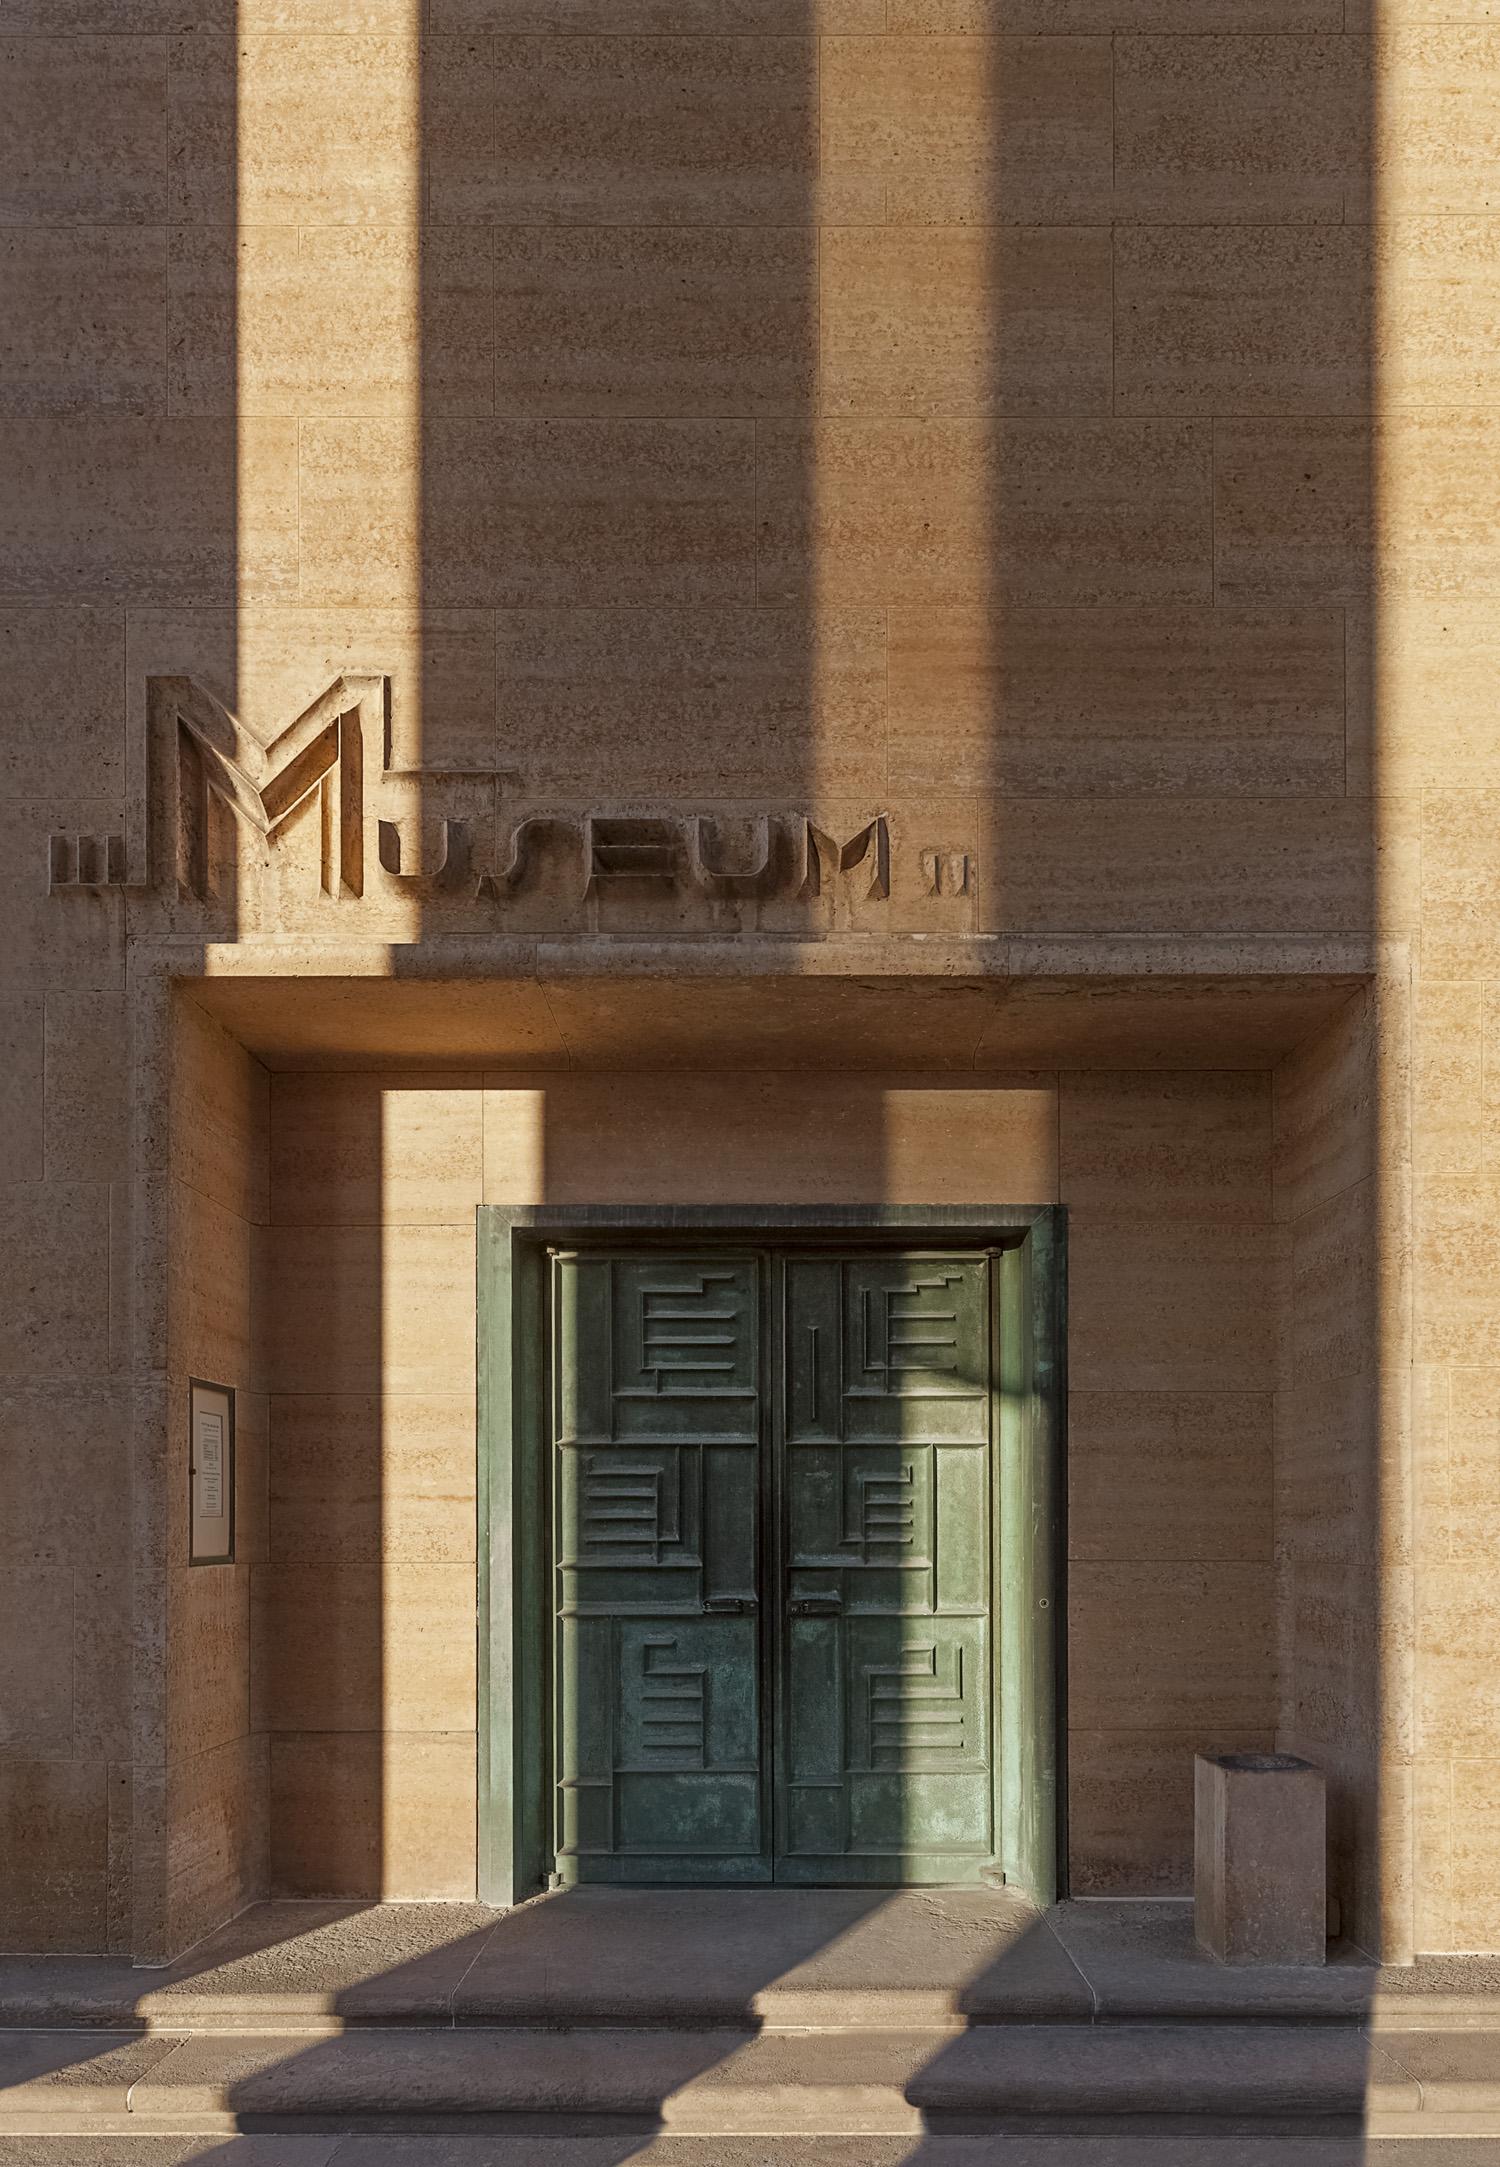 Cranbrook Academy of Art / Bloomfield Hills MI / Eliel Saarinen Architect